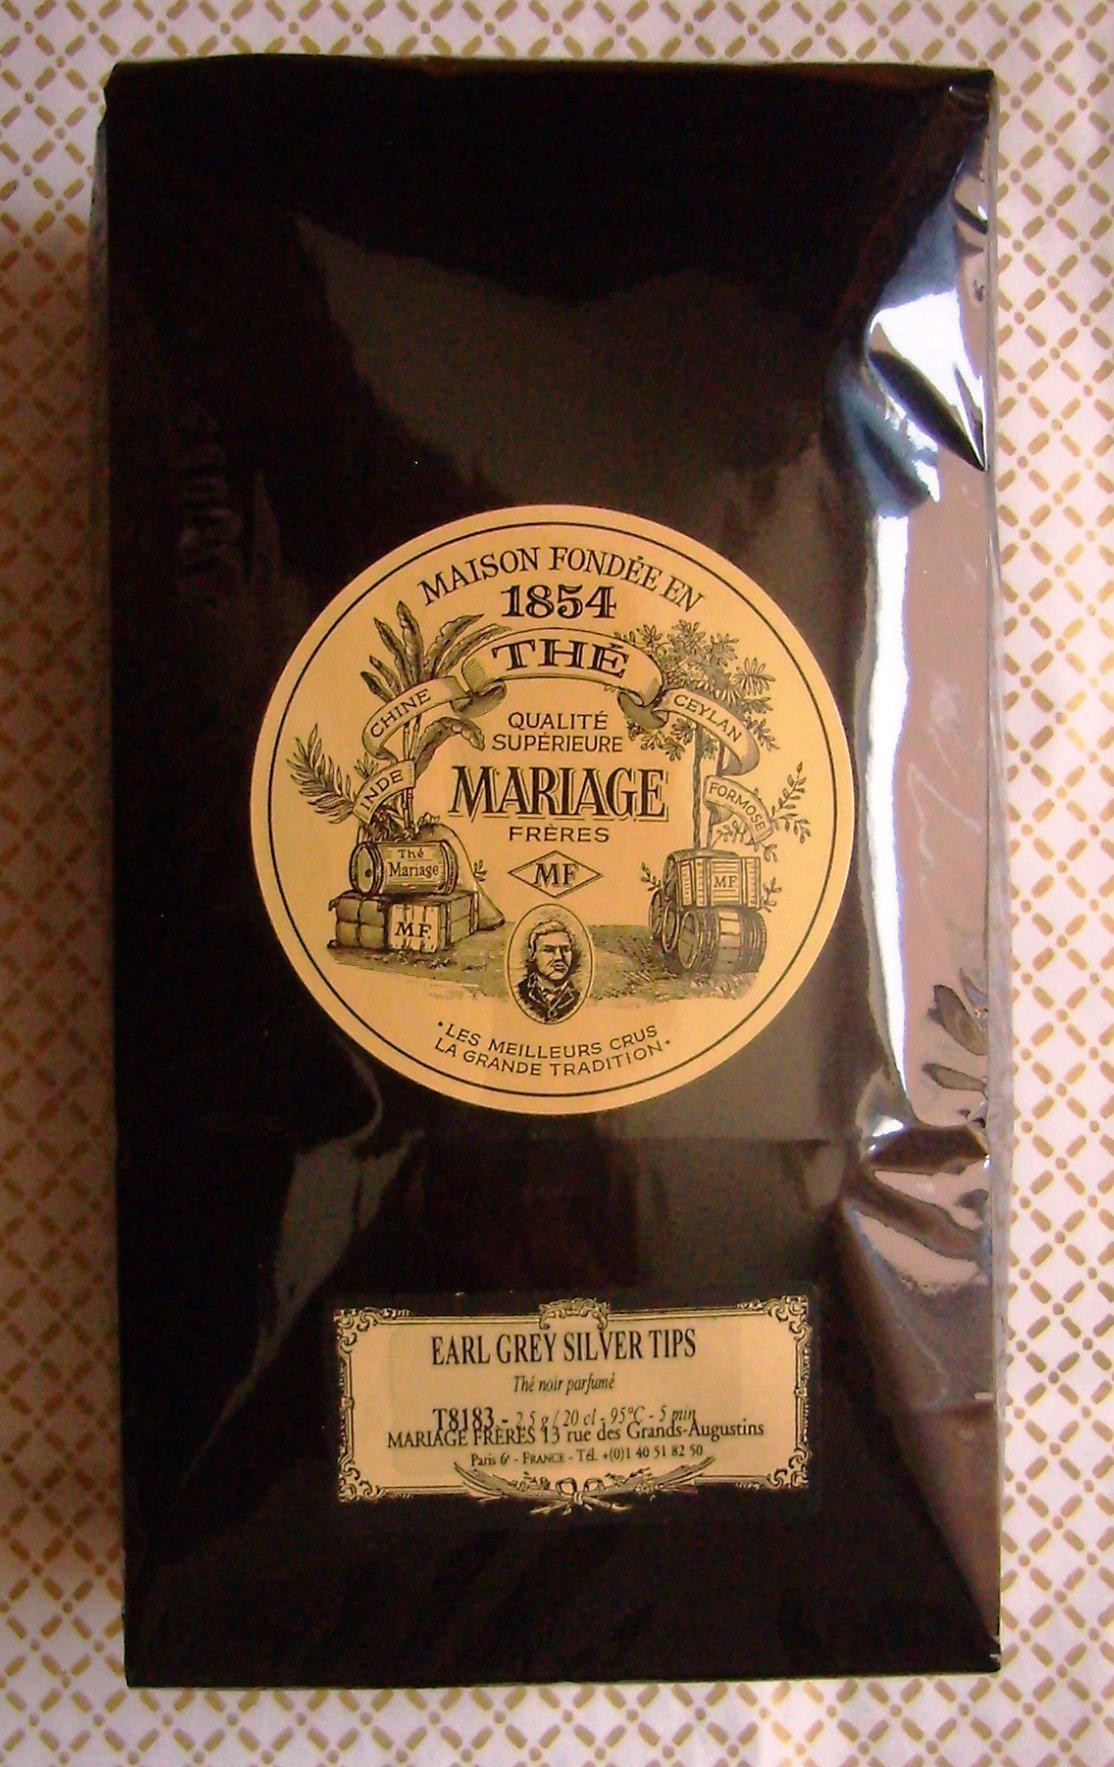 Mariage Freres - EARL GREY SILVER TIPS (T8183) - 17.63oz / 500gr Loose Leaf BULK BAG